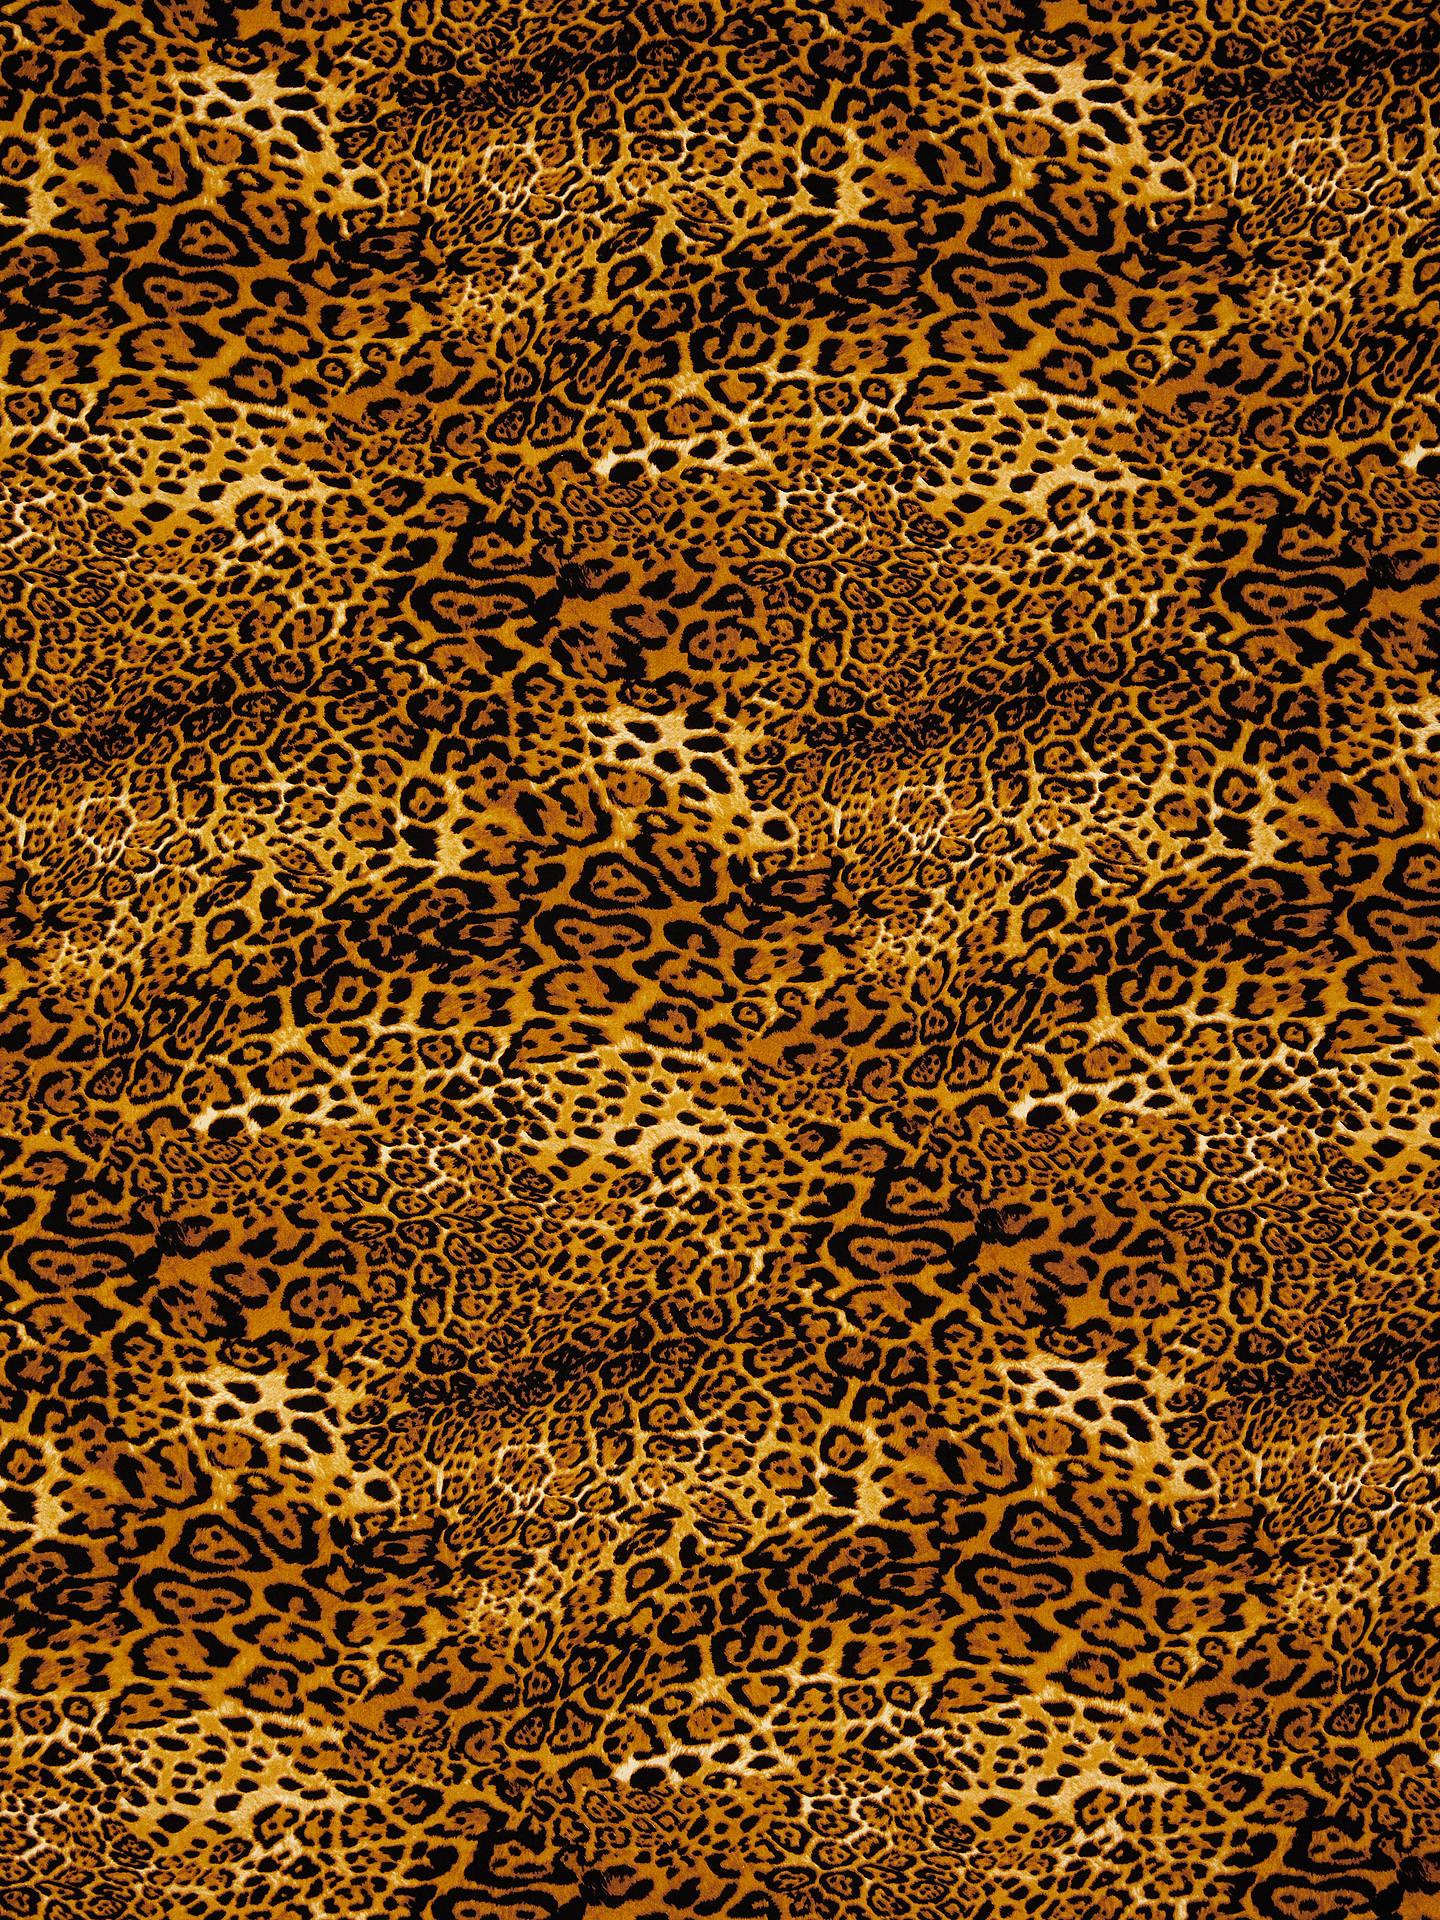 e4b146091d06 Buy Oddies Textiles Leopard Print Fabric